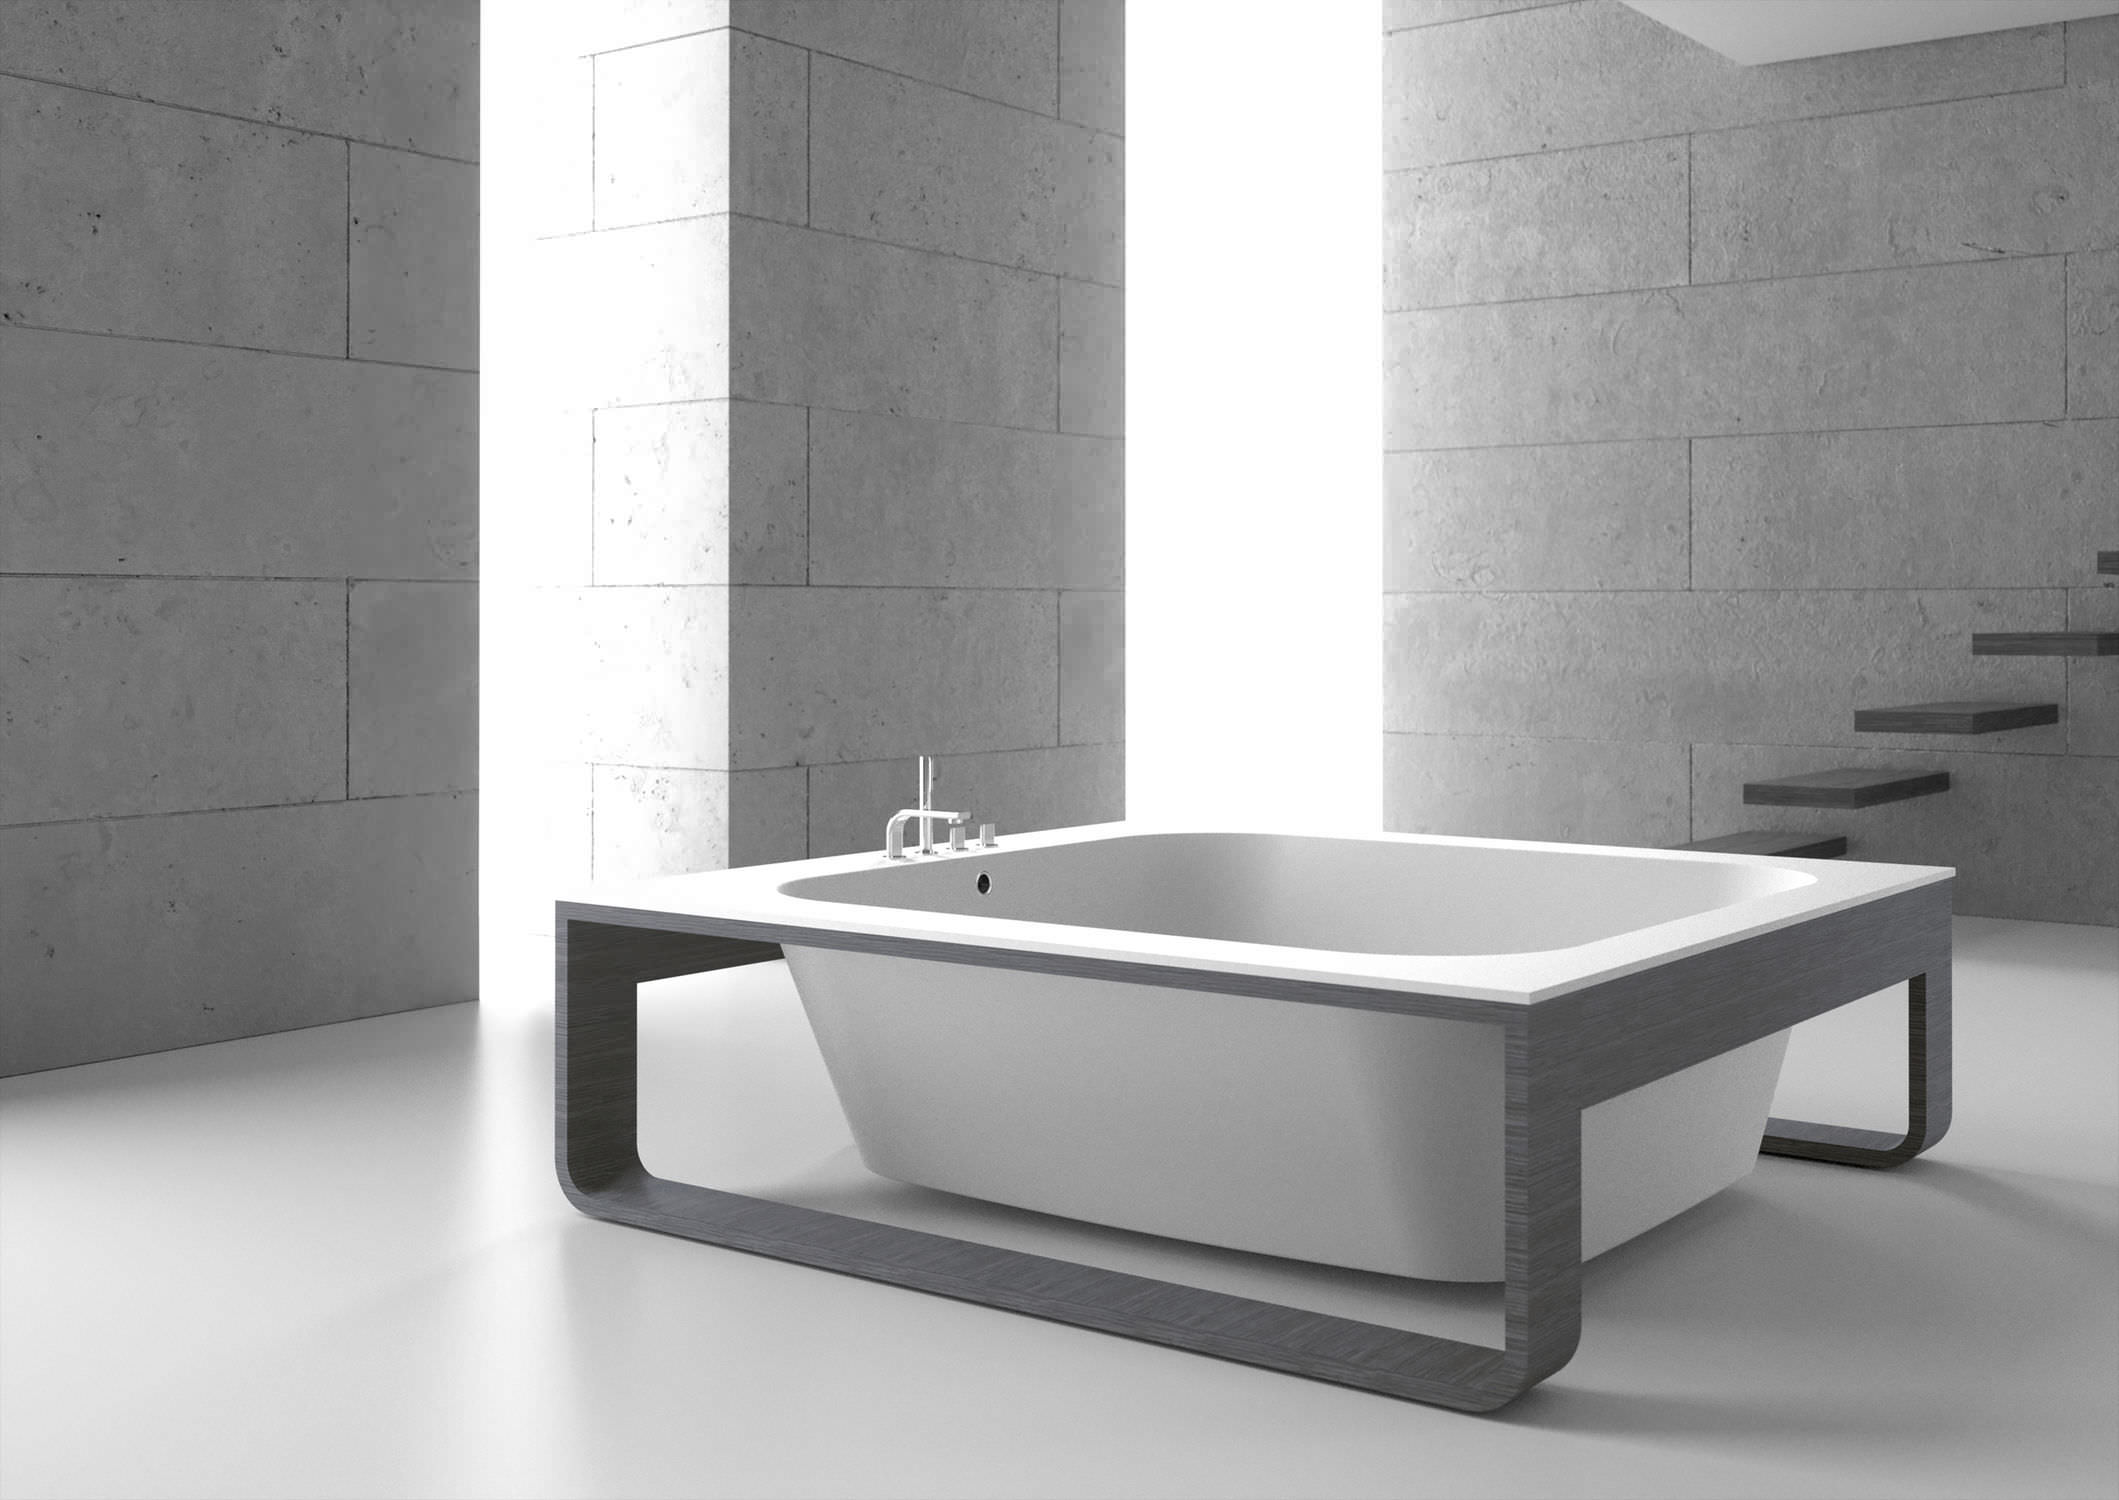 Vasche Da Bagno Quadrate : Vasca da bagno karen vasca da bagno quadrata siefreach